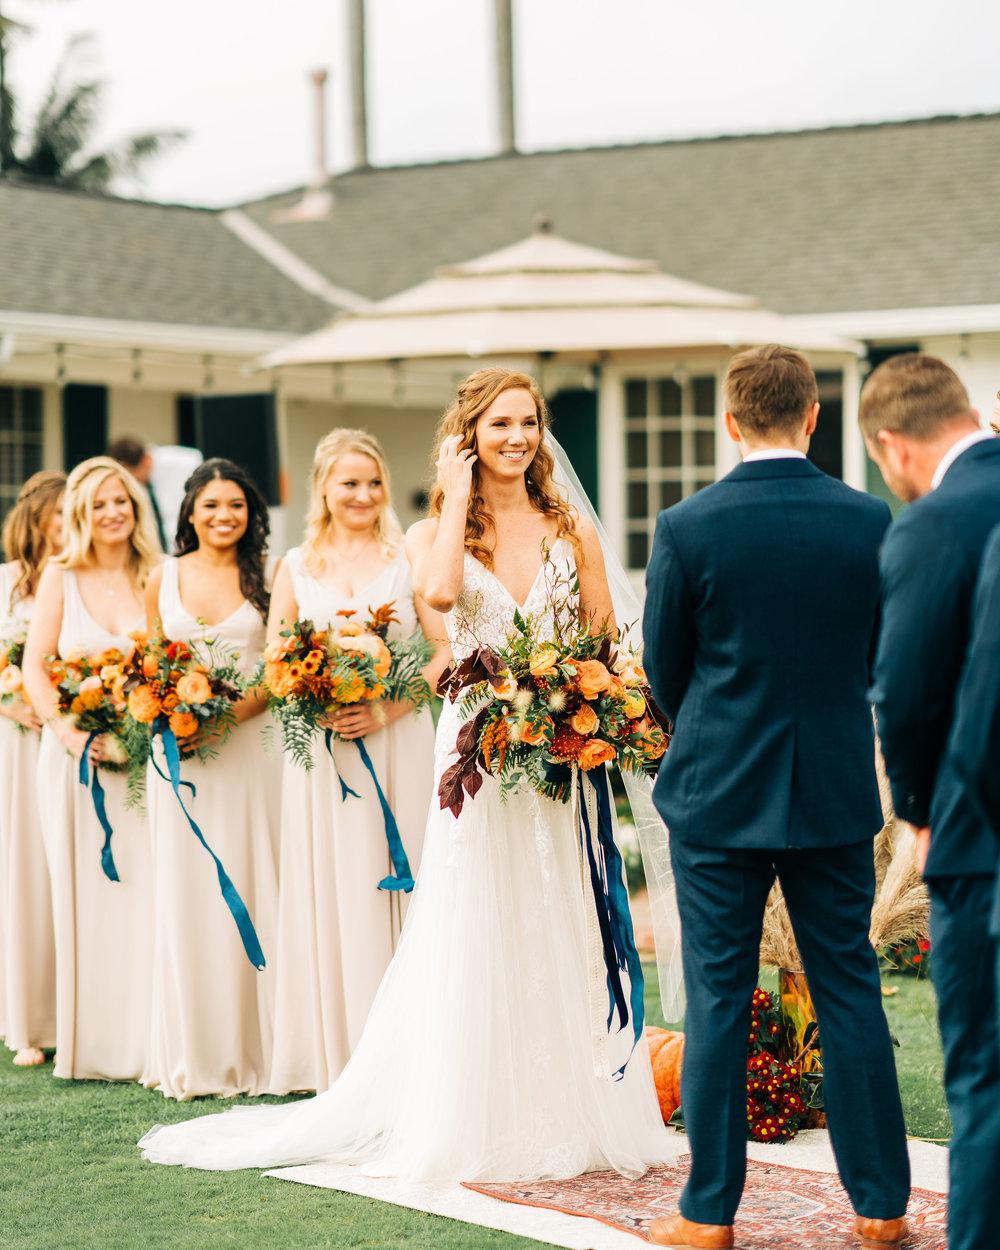 allie-shupe-tyler-wiggins-wedding-santa-barbara 096.jpg